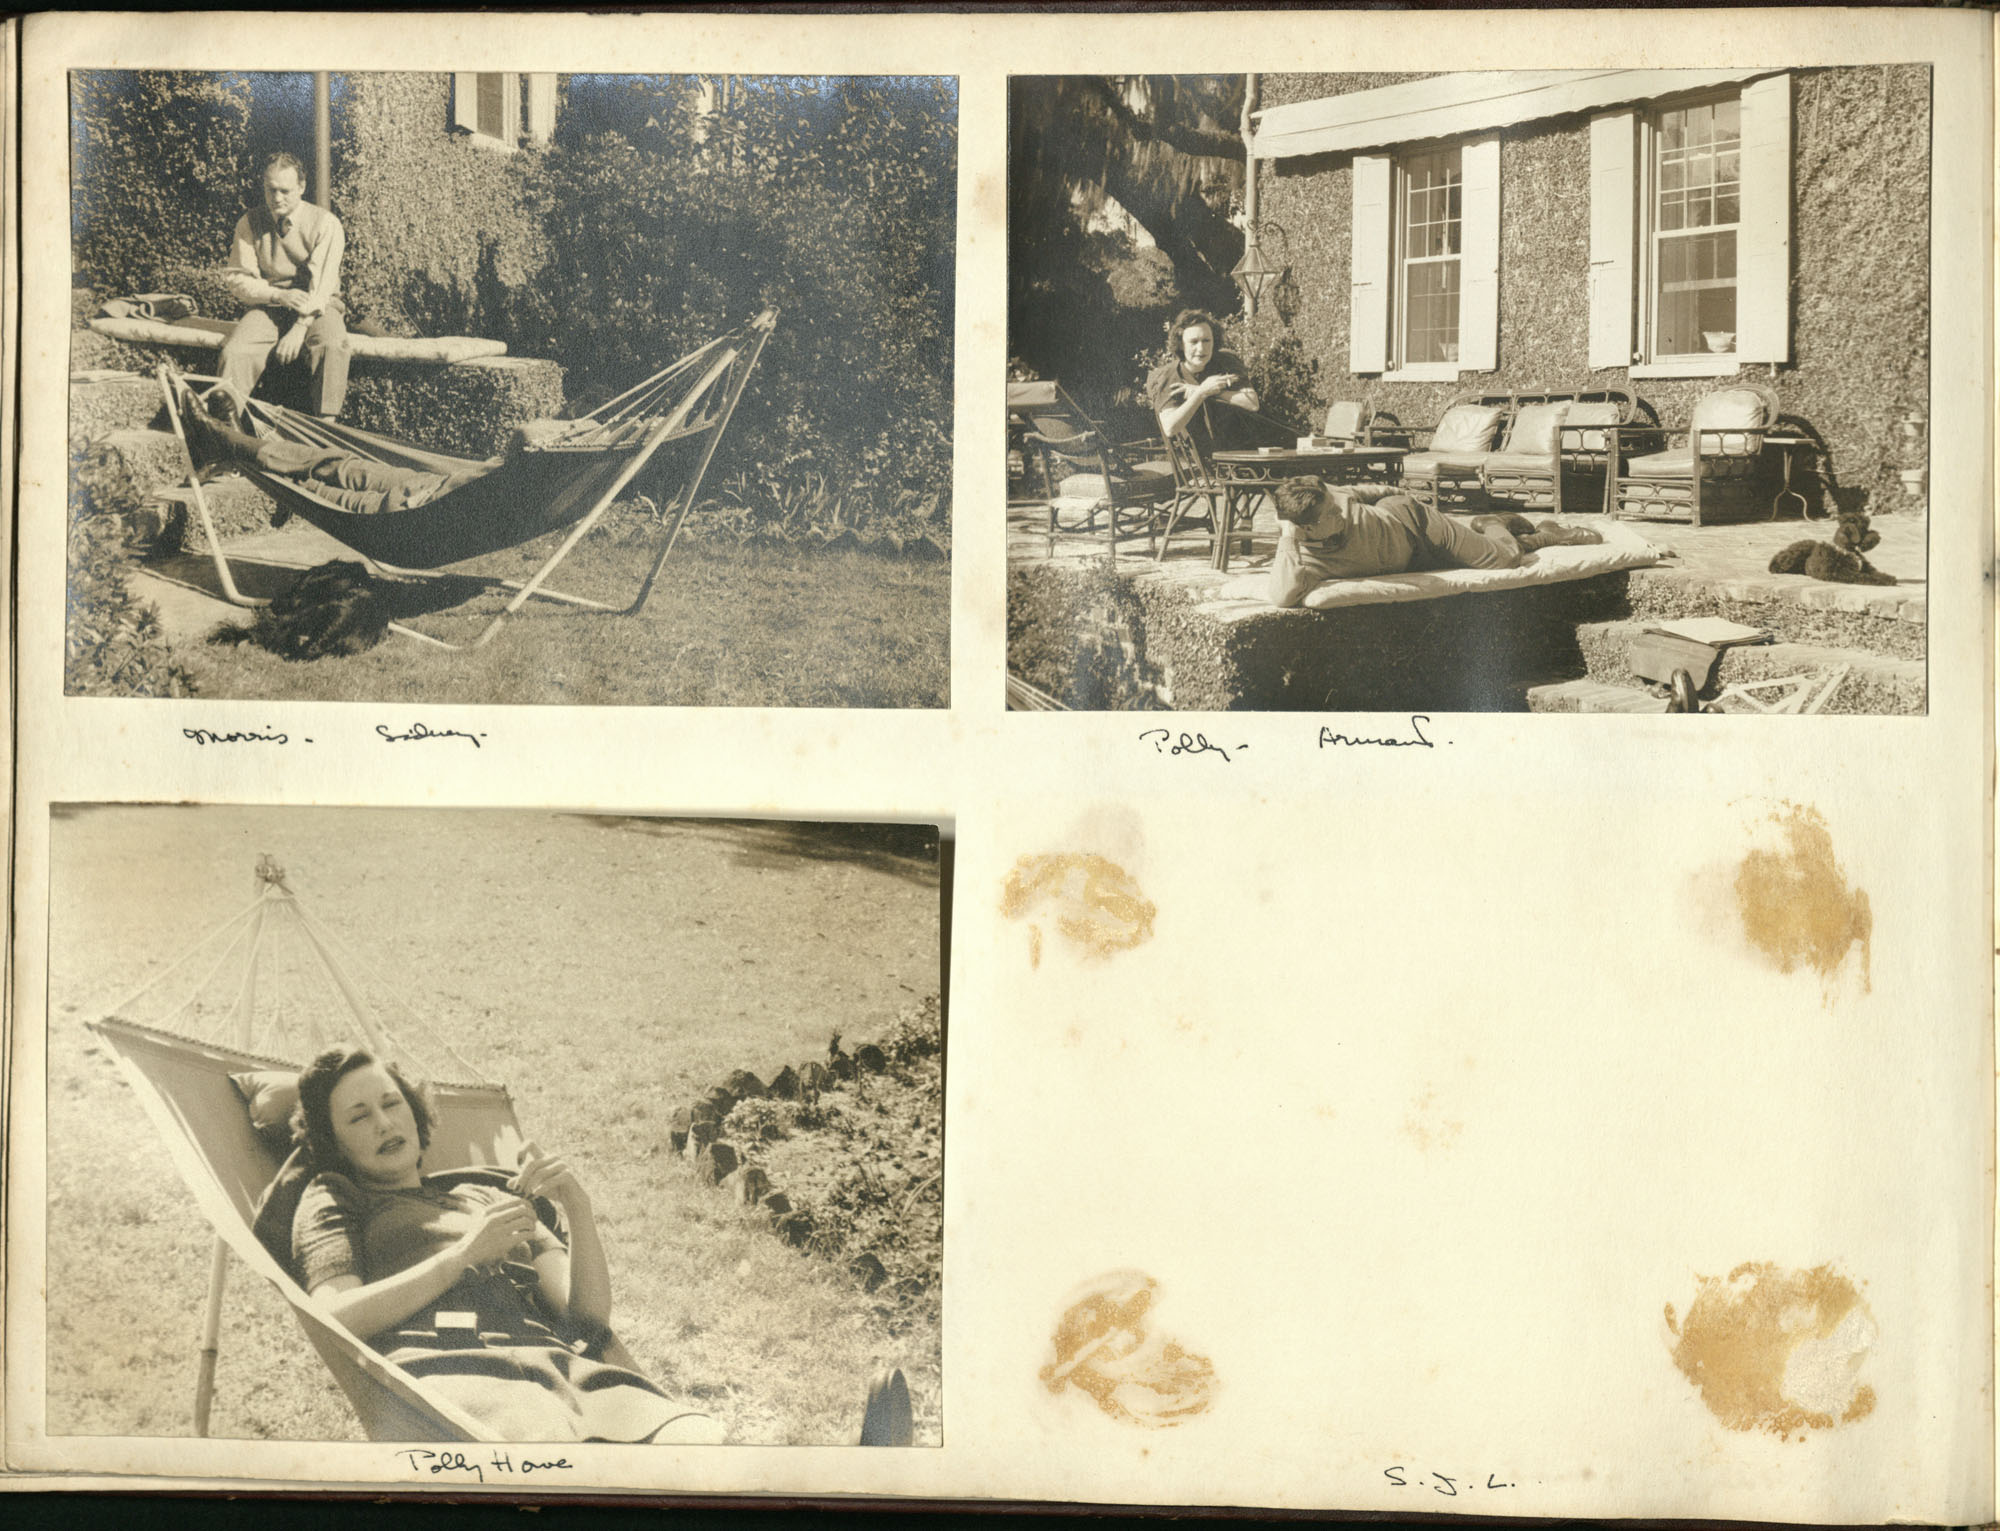 Medway Plantation Photograph Album, 1949, page 10